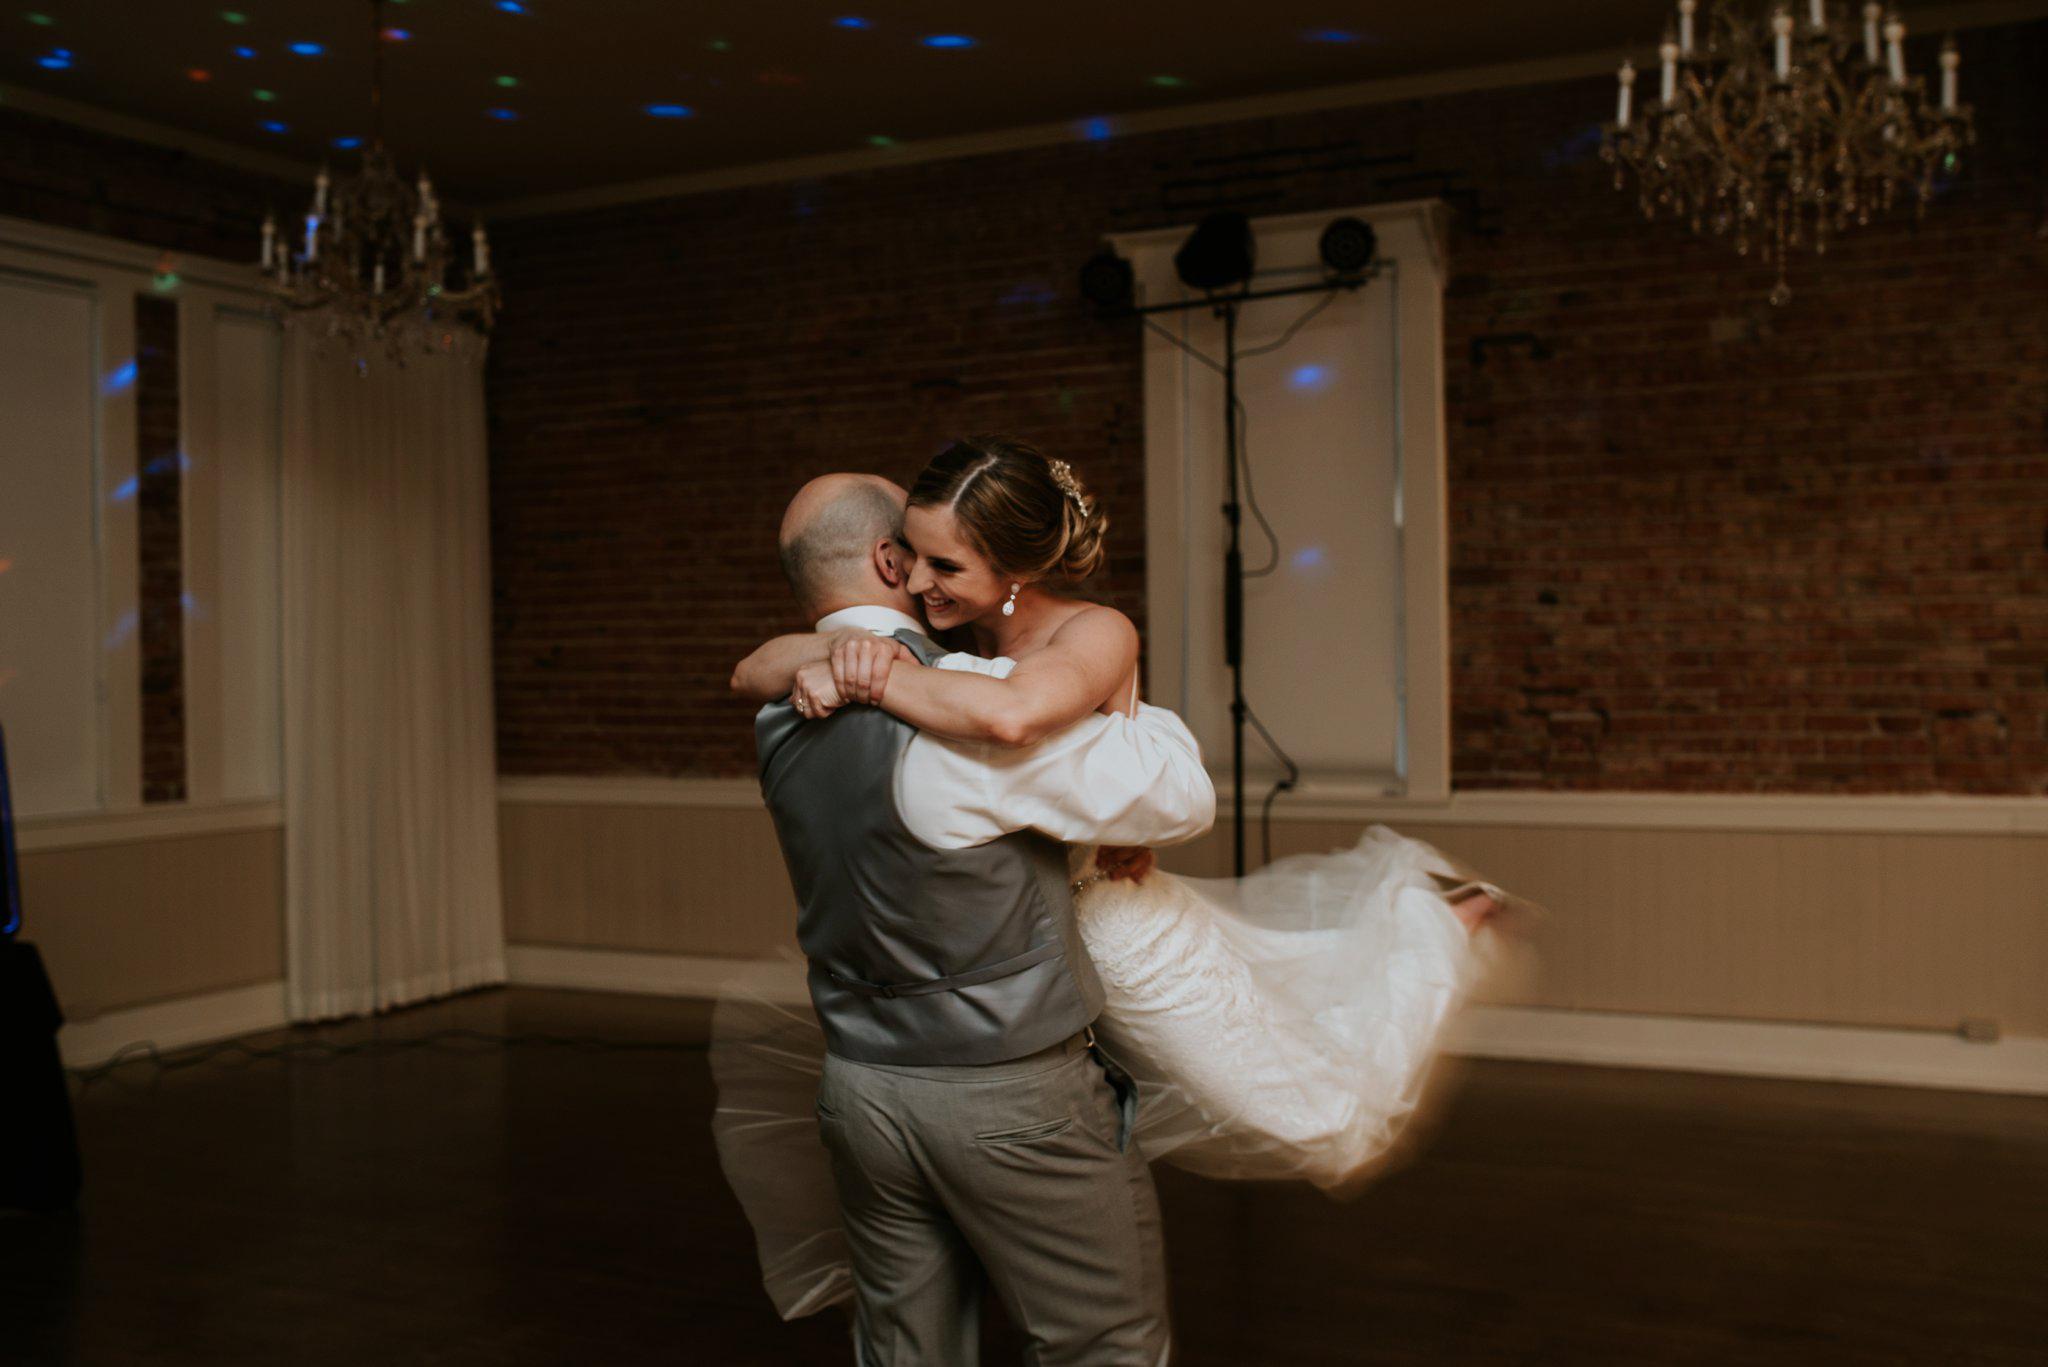 hollywood-school-house-wedding-seattle-photographer-caitlyn-nikula-112.jpg